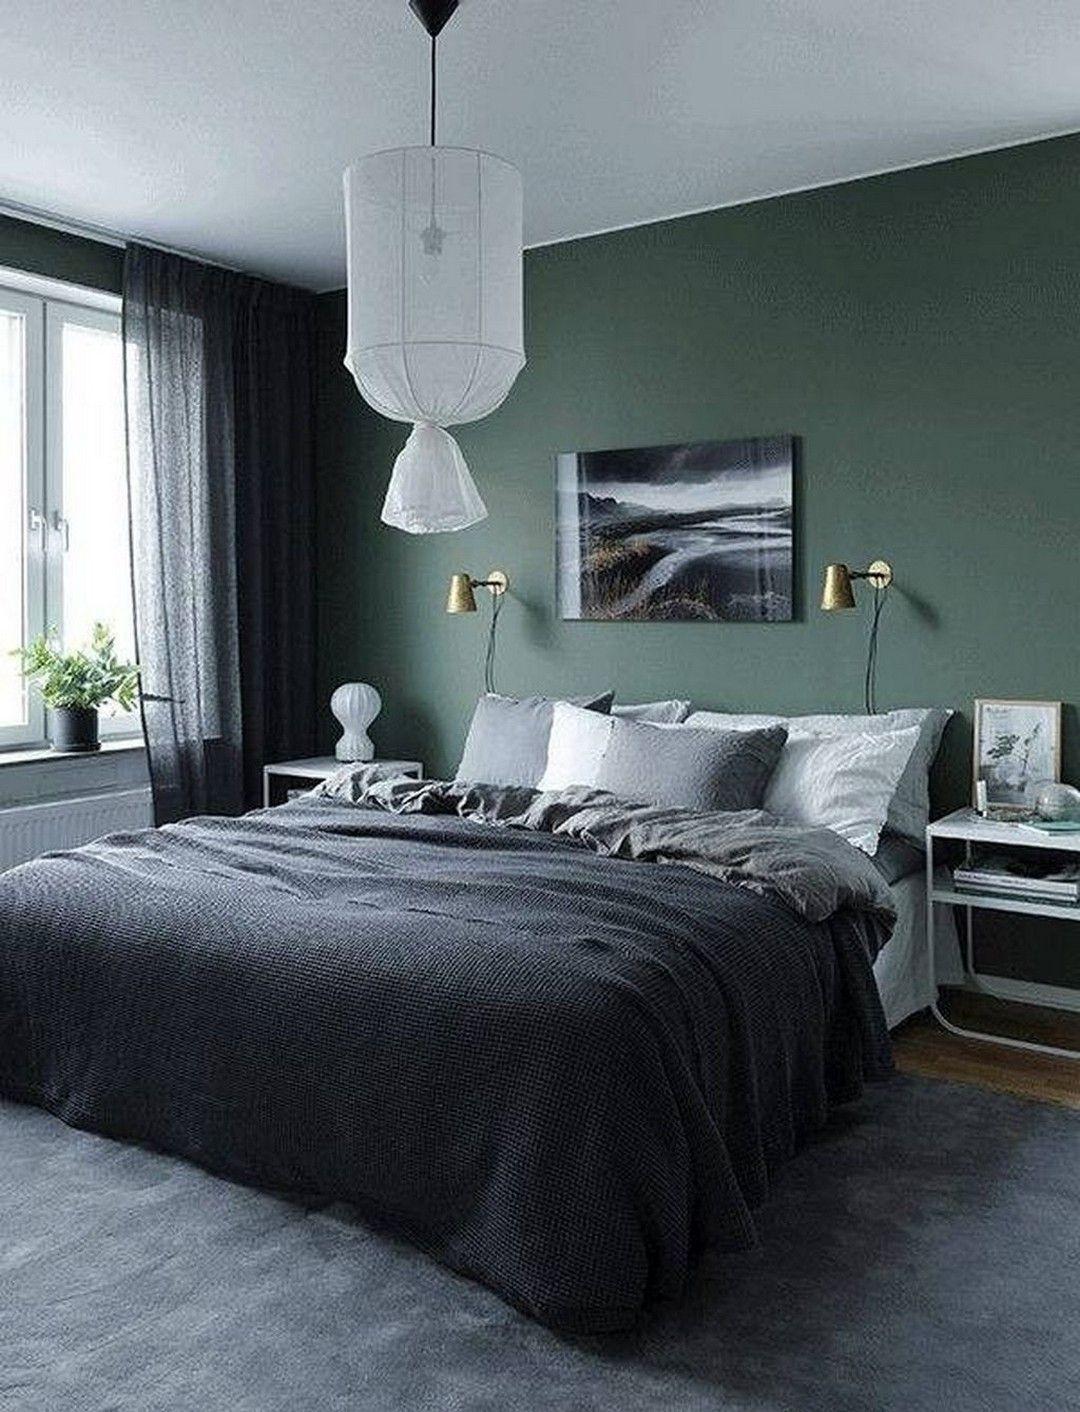 Stunning Modern Colorful Bedroom Decor Ideas 27